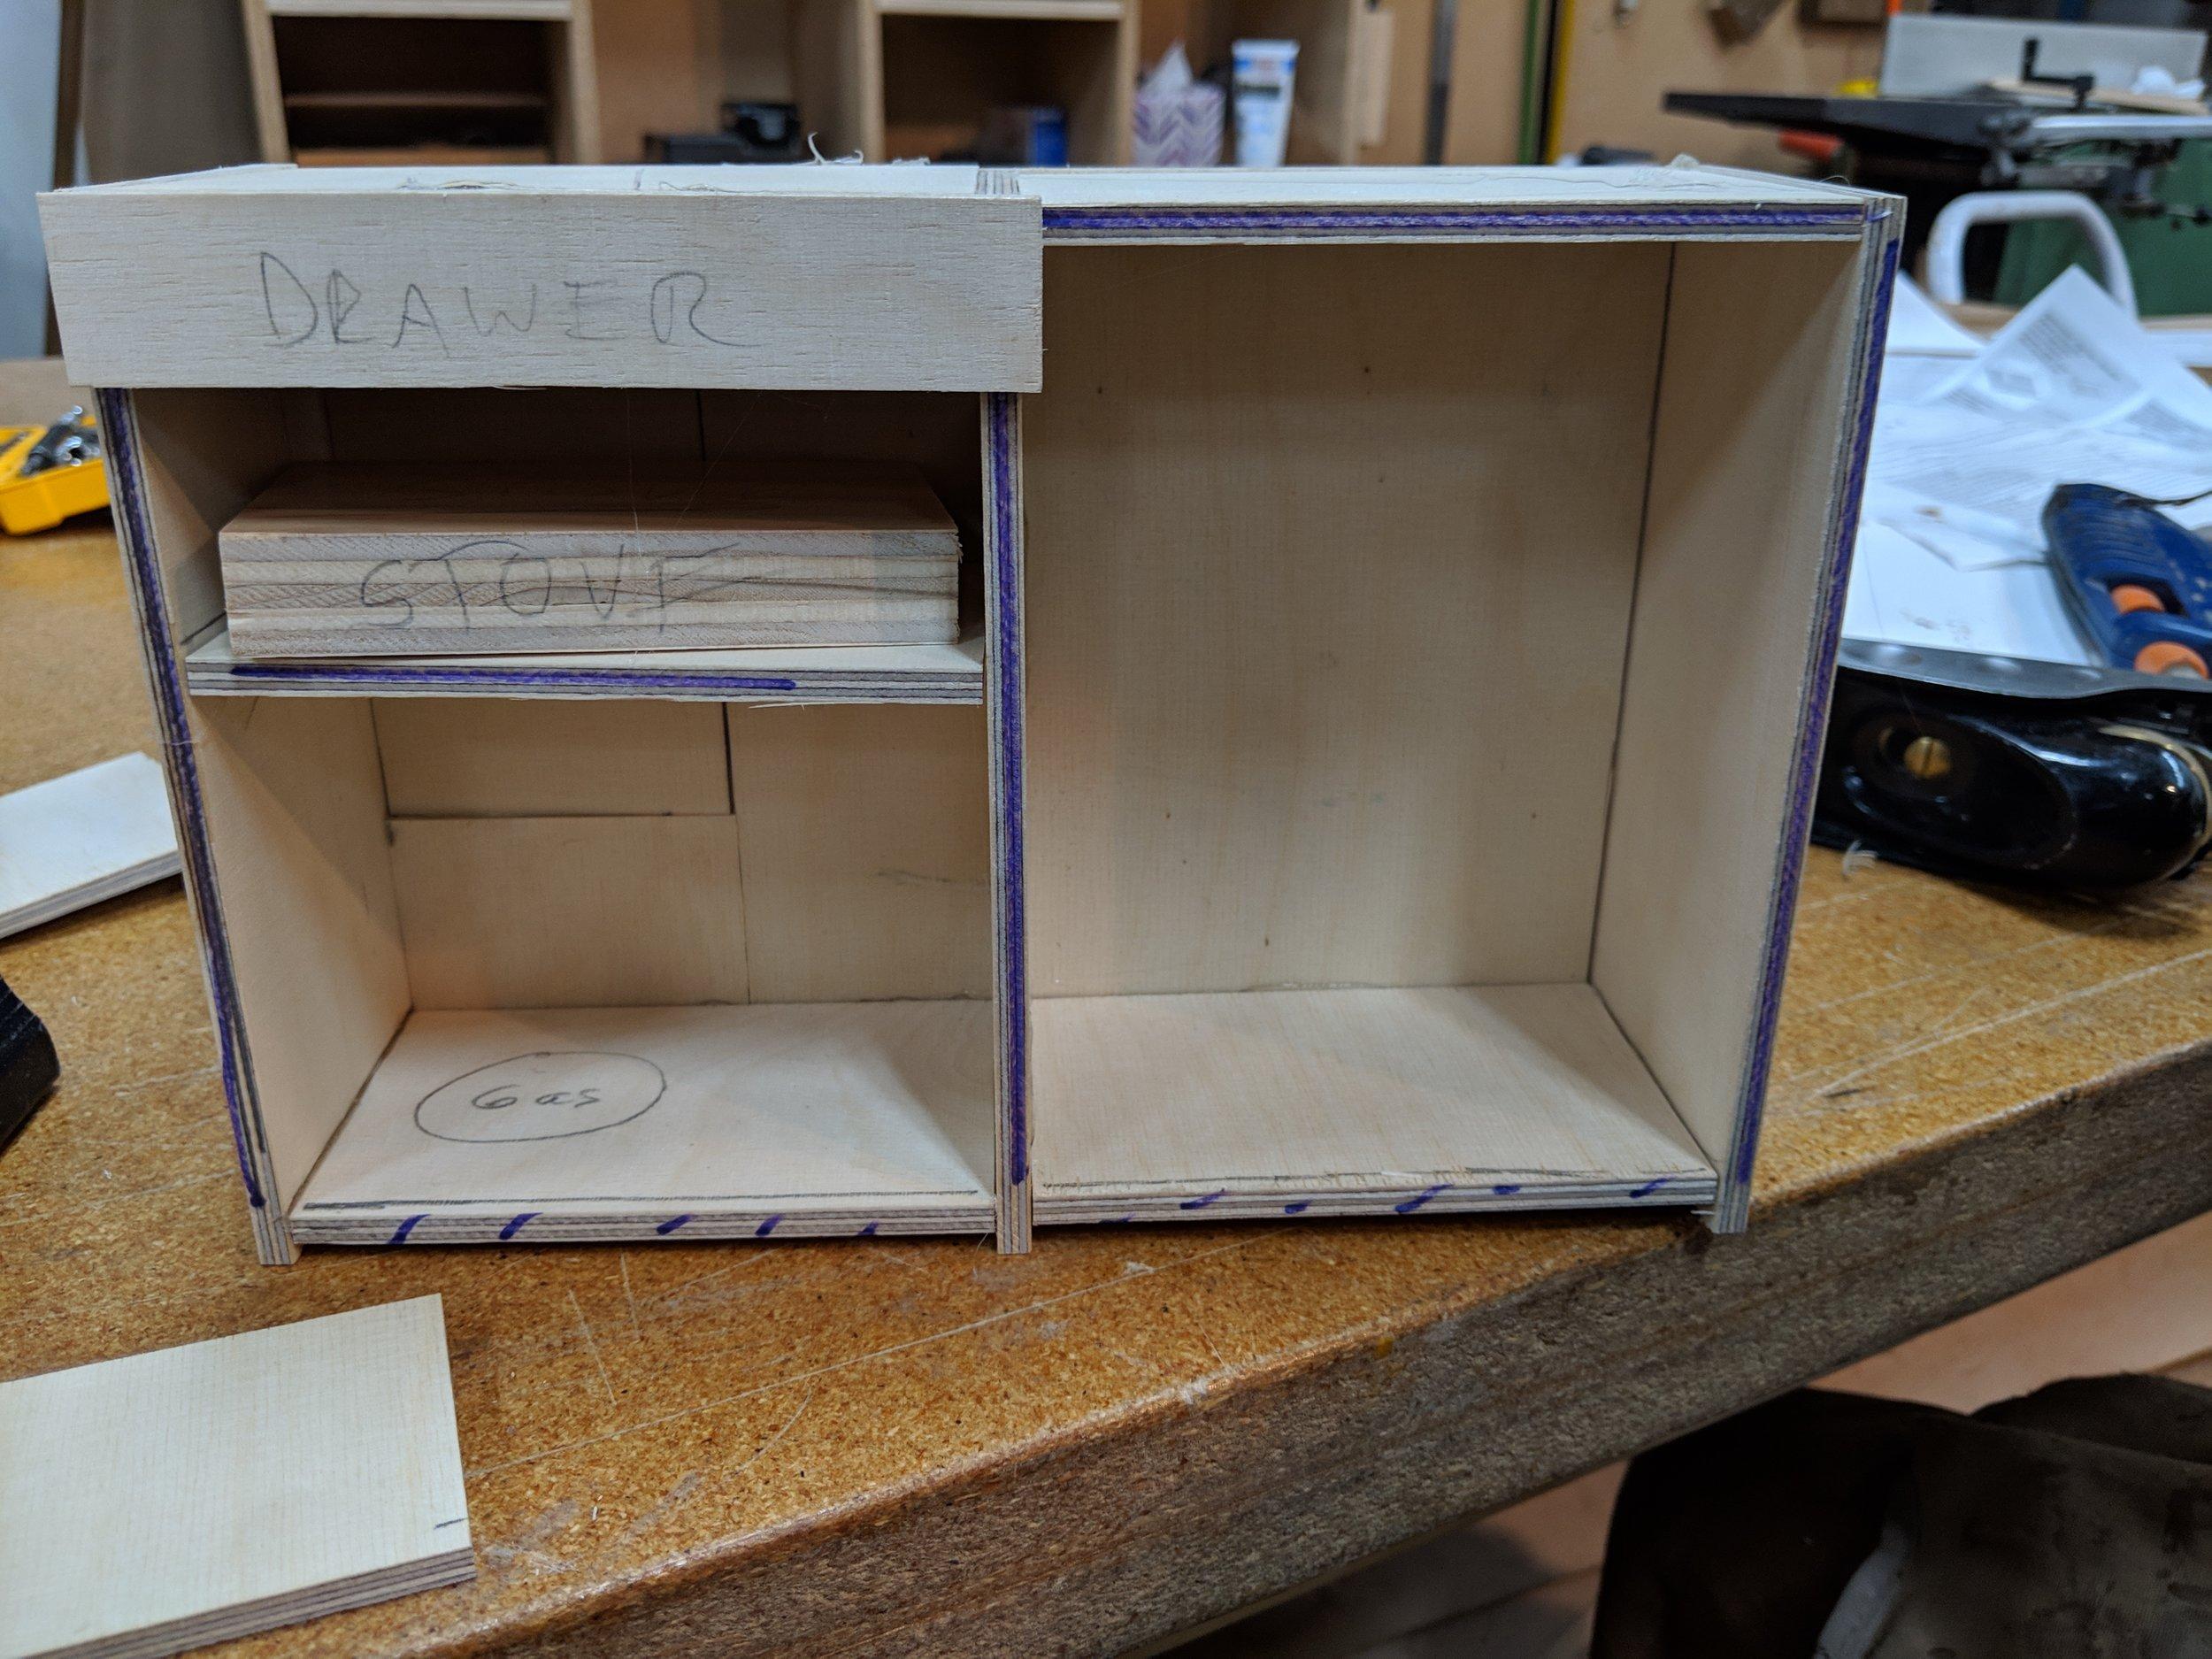 Passenger side cabinet model